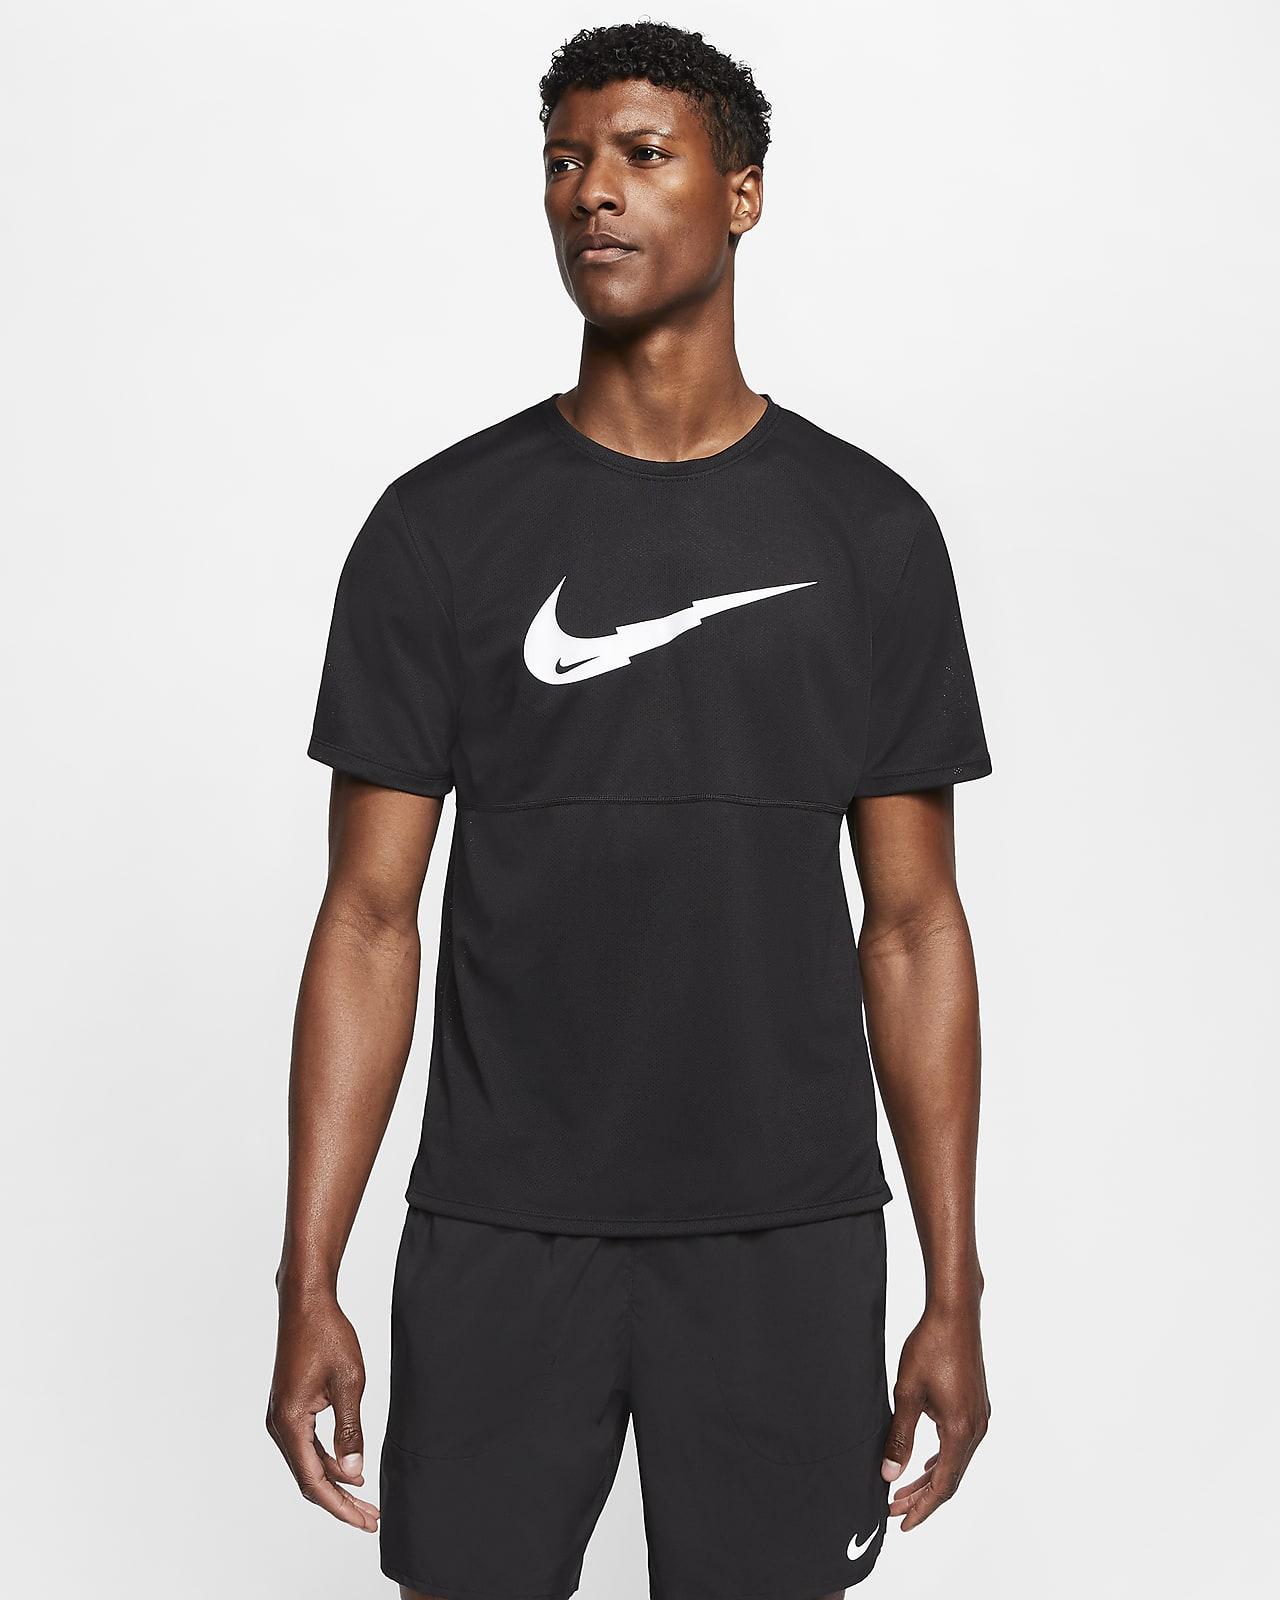 Nike Breathe Men's Running Top